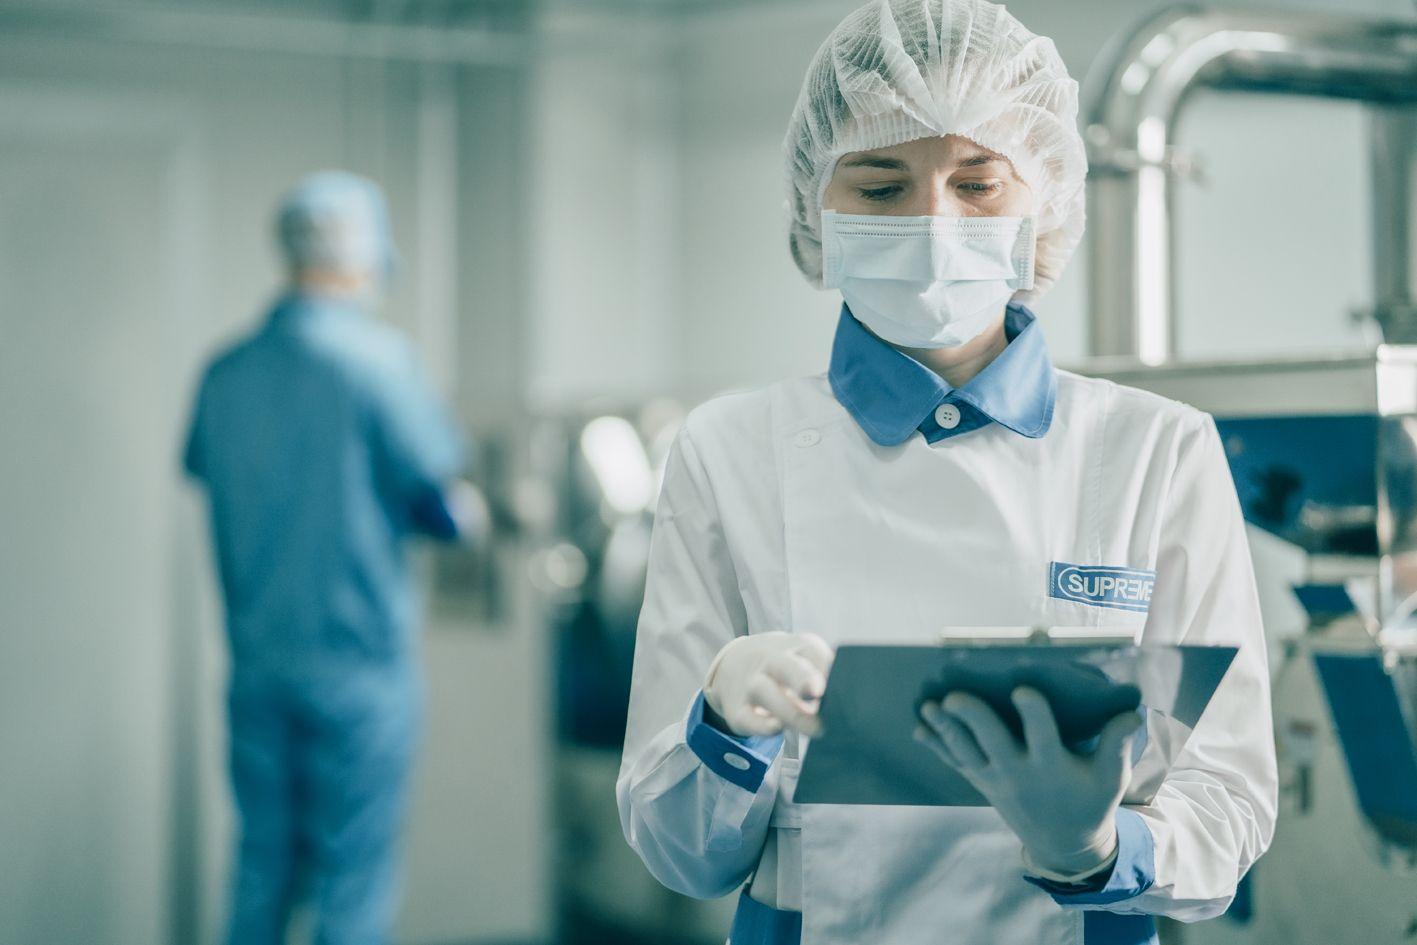 Supreme Pharmatech Report